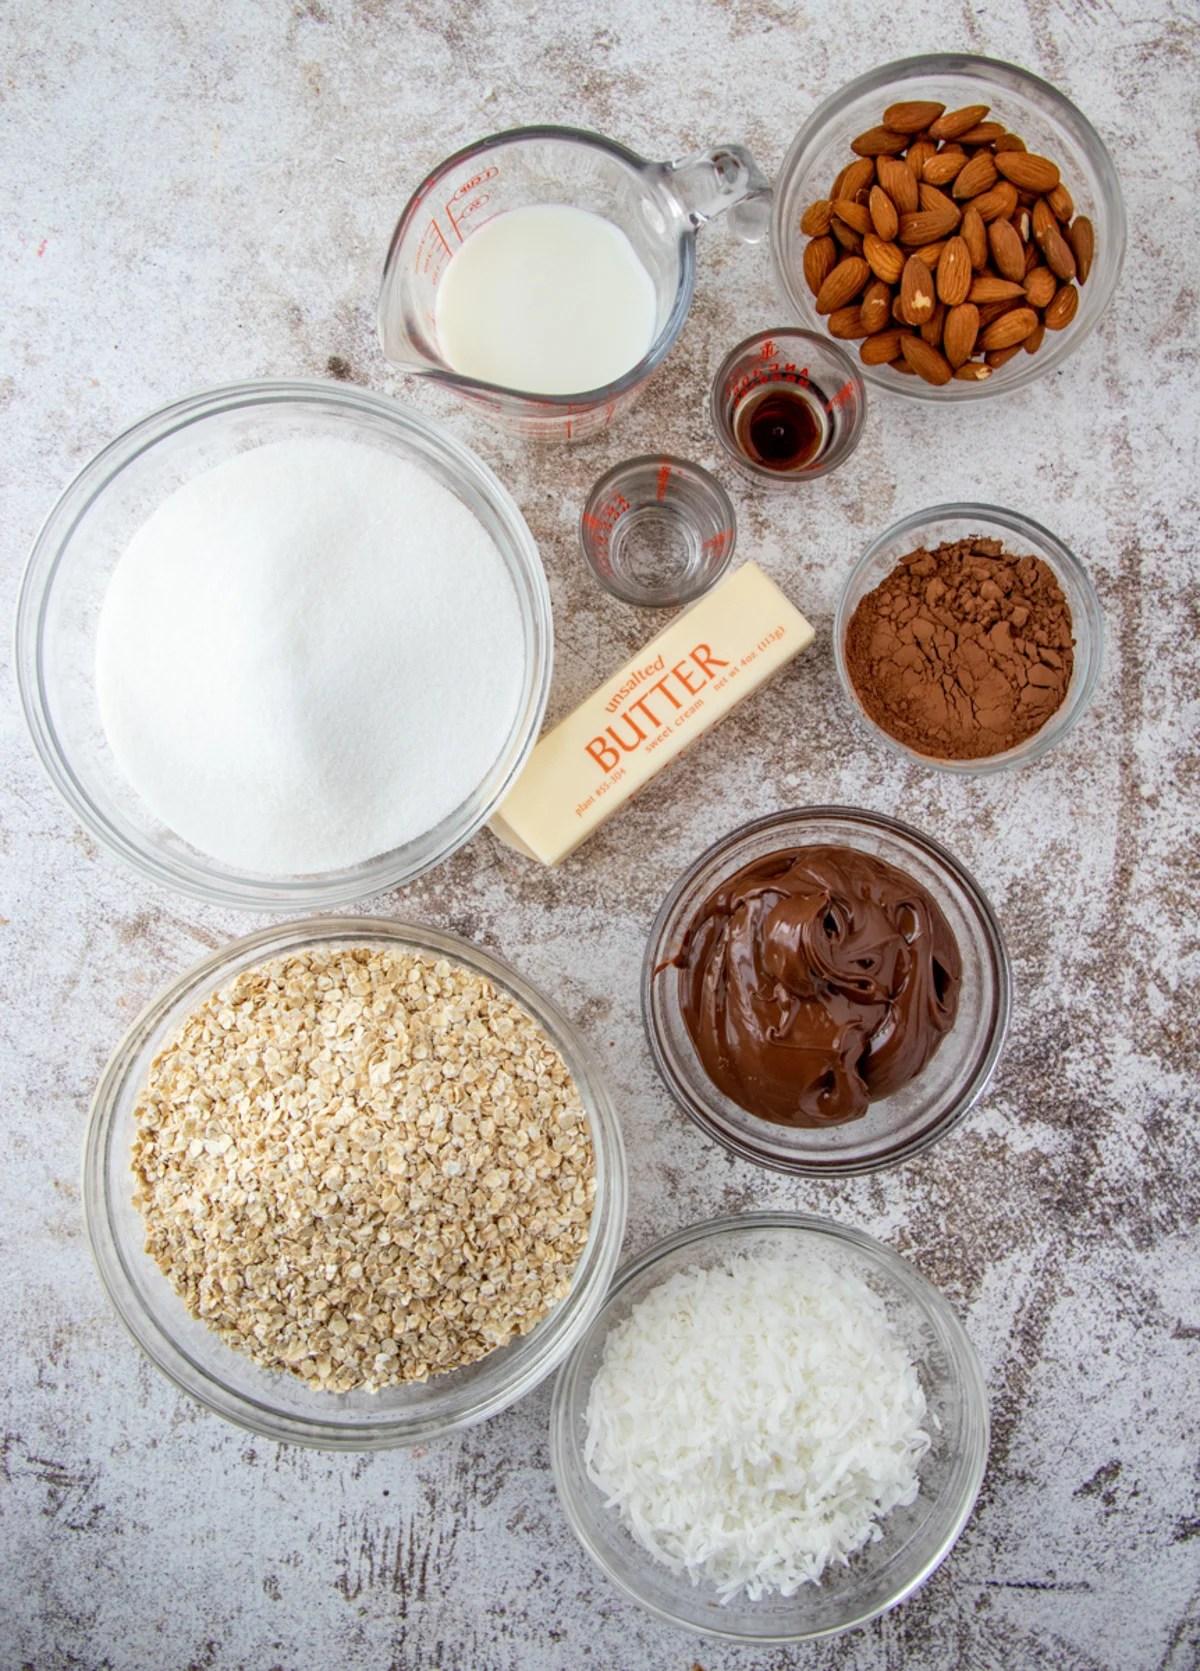 Ingredients needed to make No Bake Almond Joy Cookies